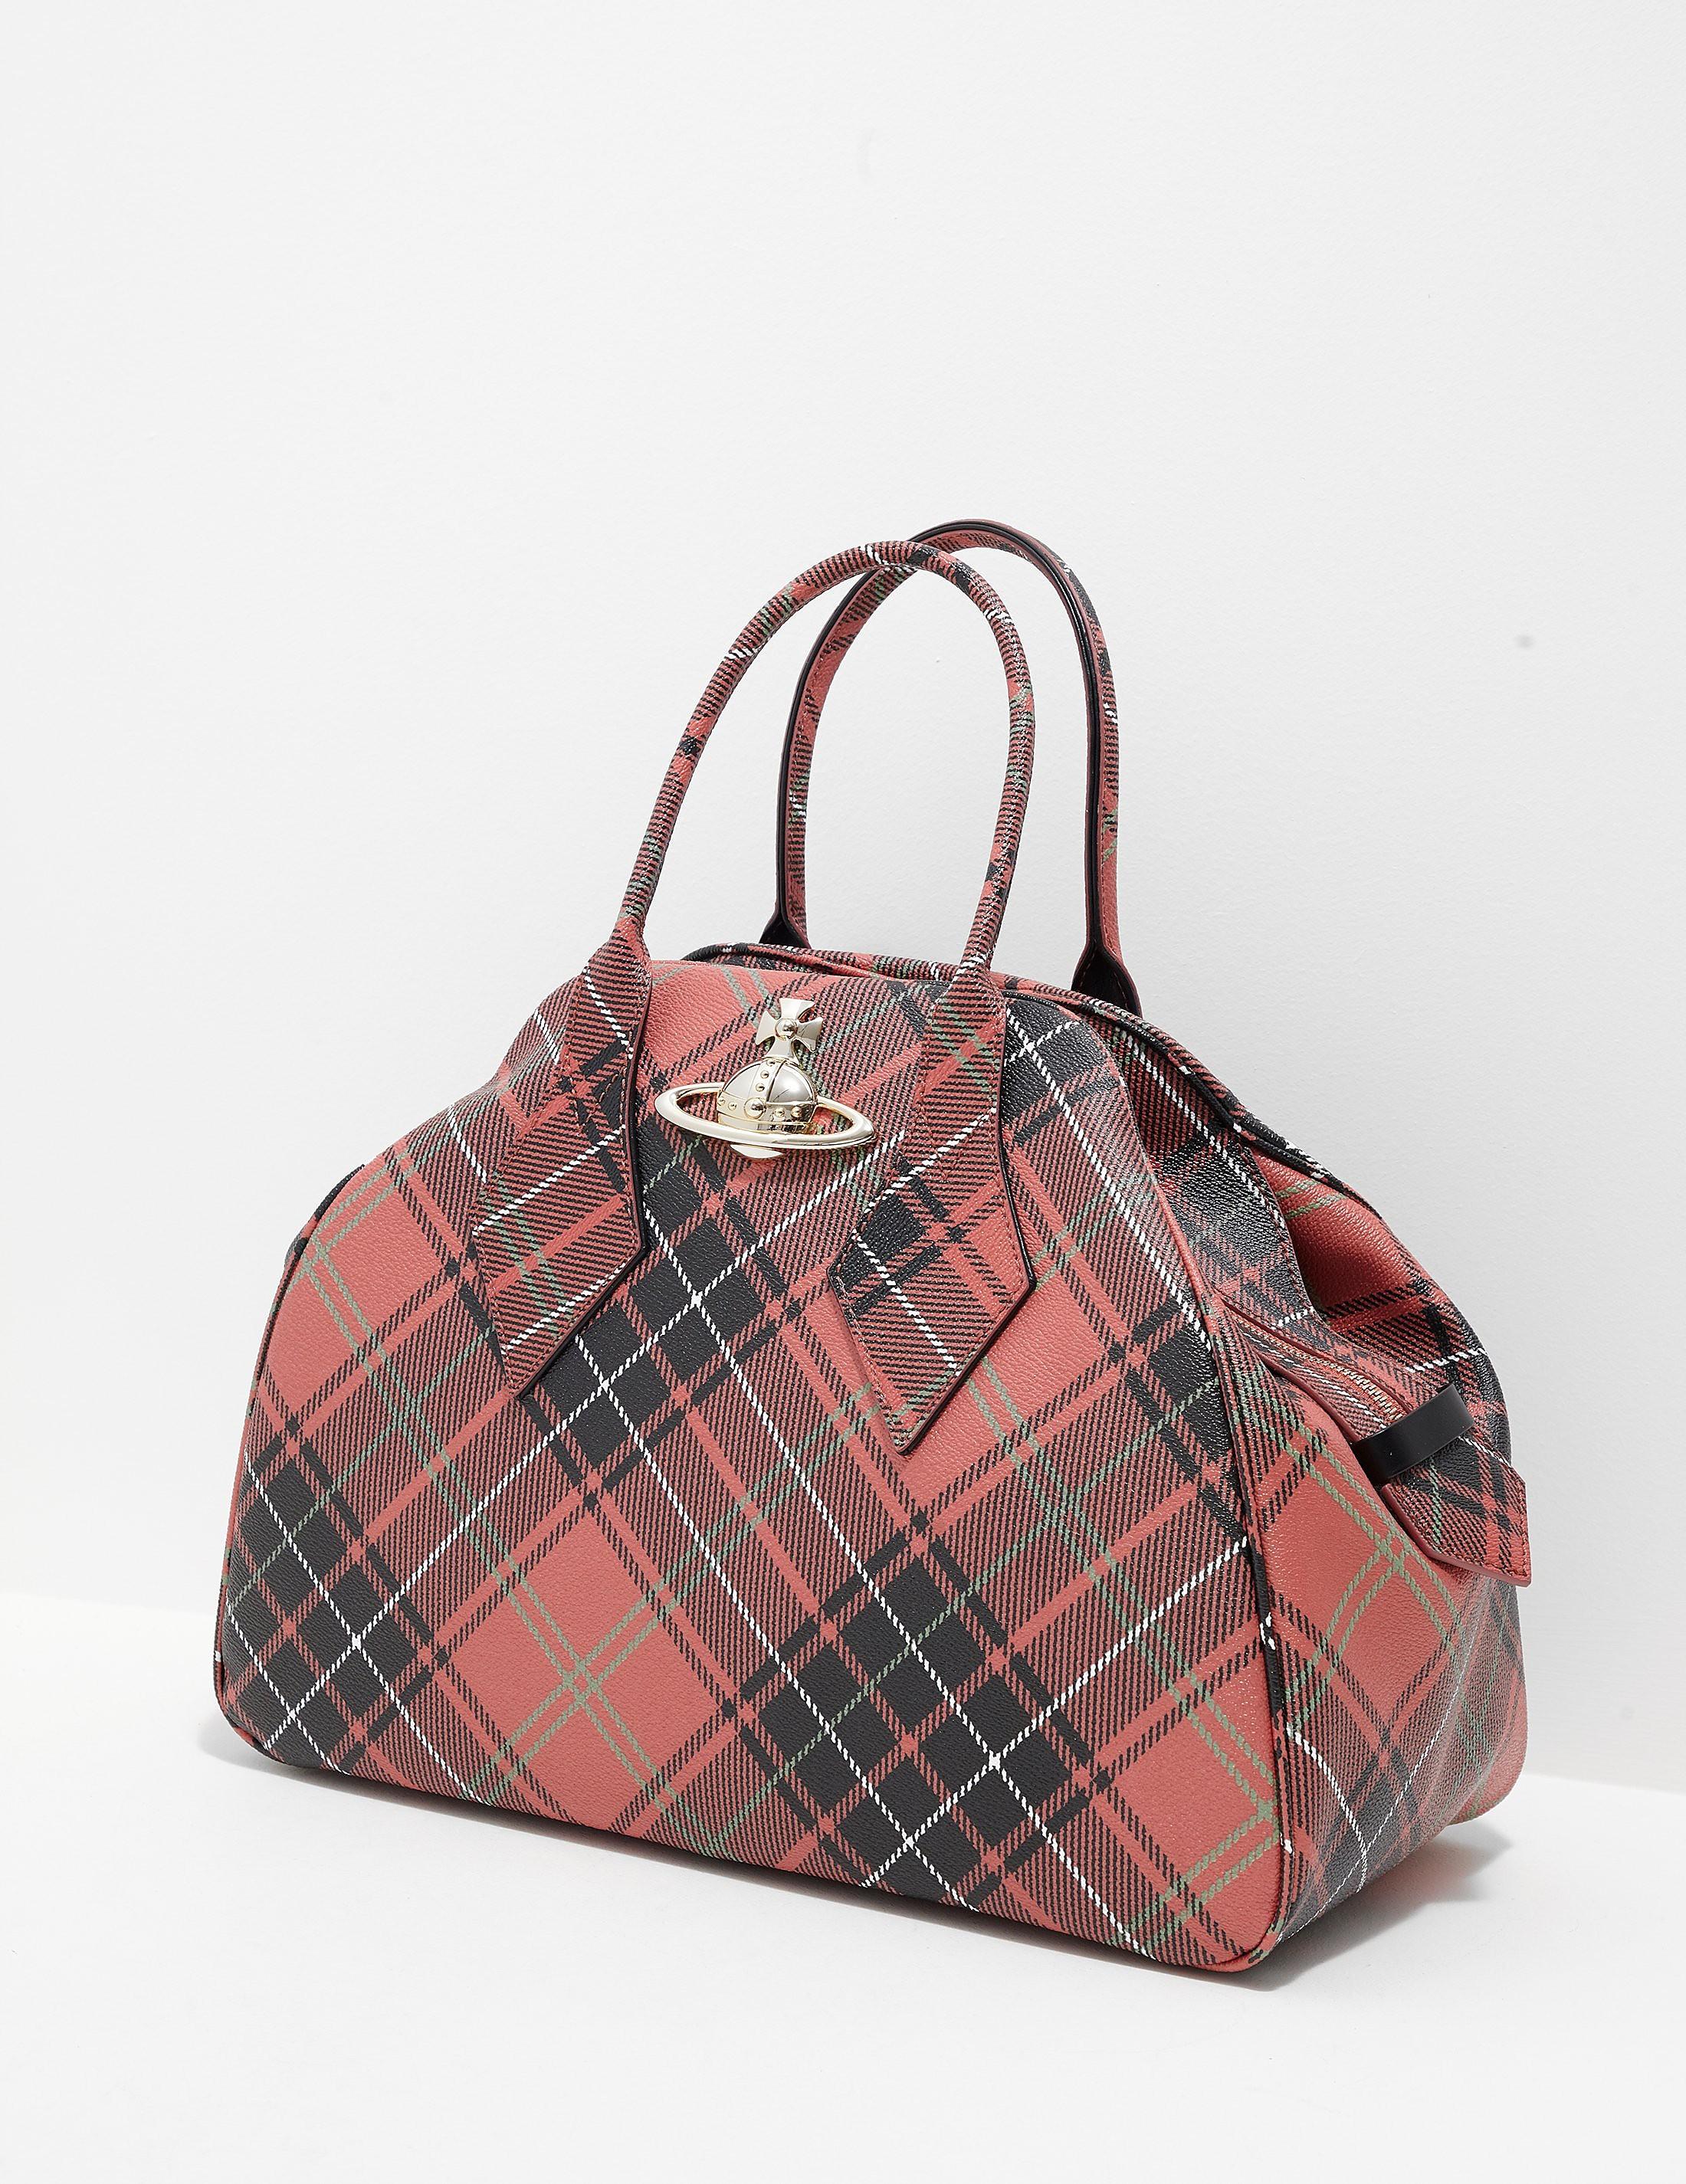 Vivienne Westwood Derby Large Dome Bag